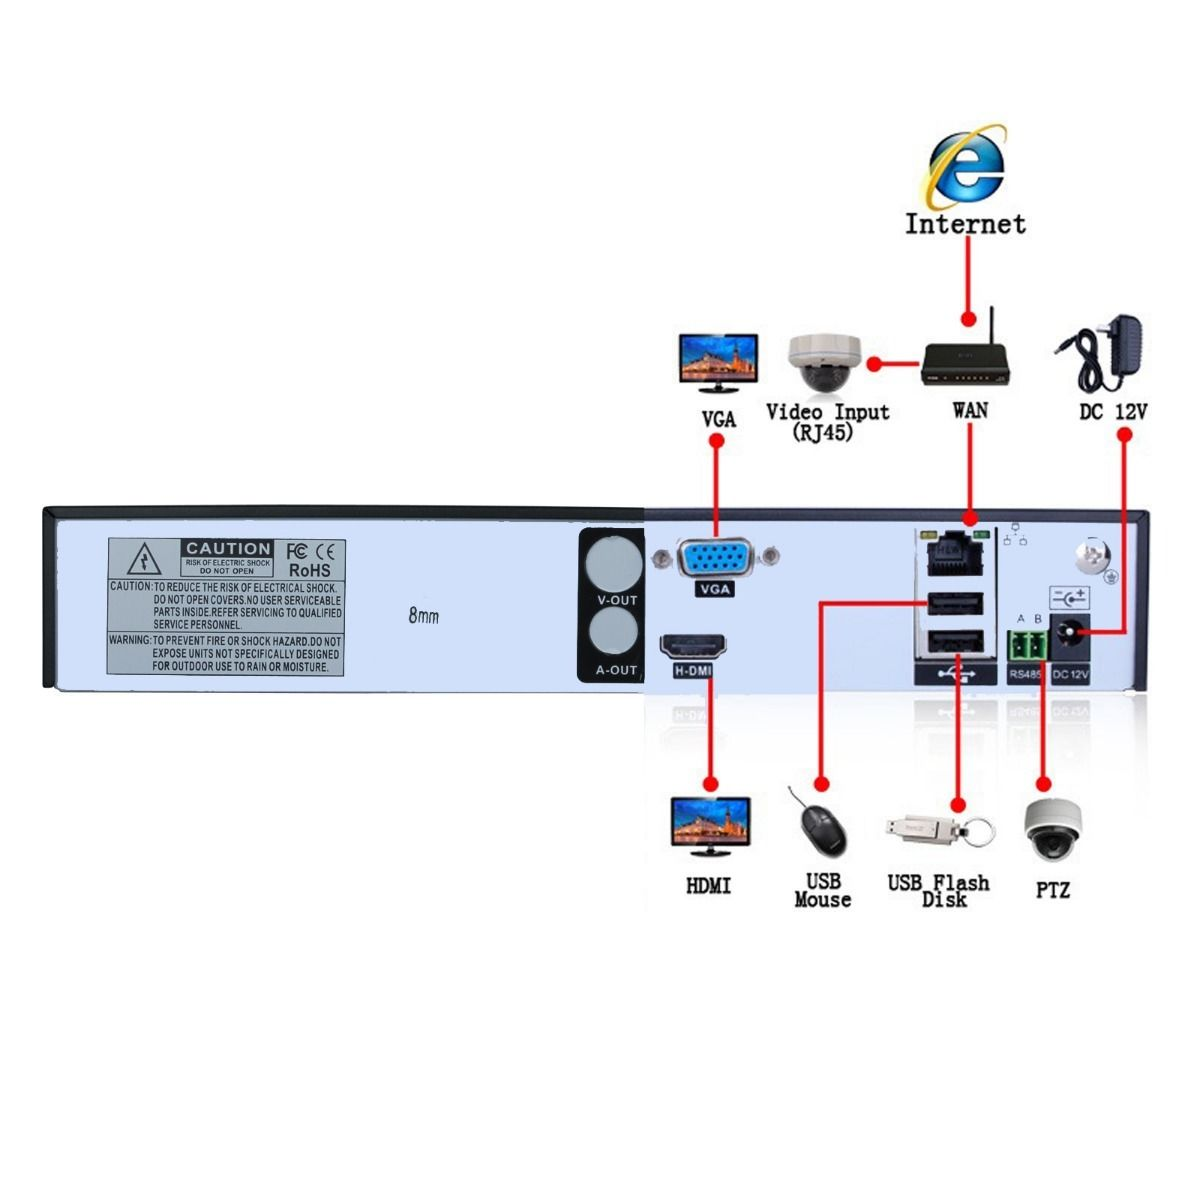 medium resolution of cat cctv wiring diagram cat image wiring diagram wiring diagram cat5 cctv images rj11 cat5 wiring